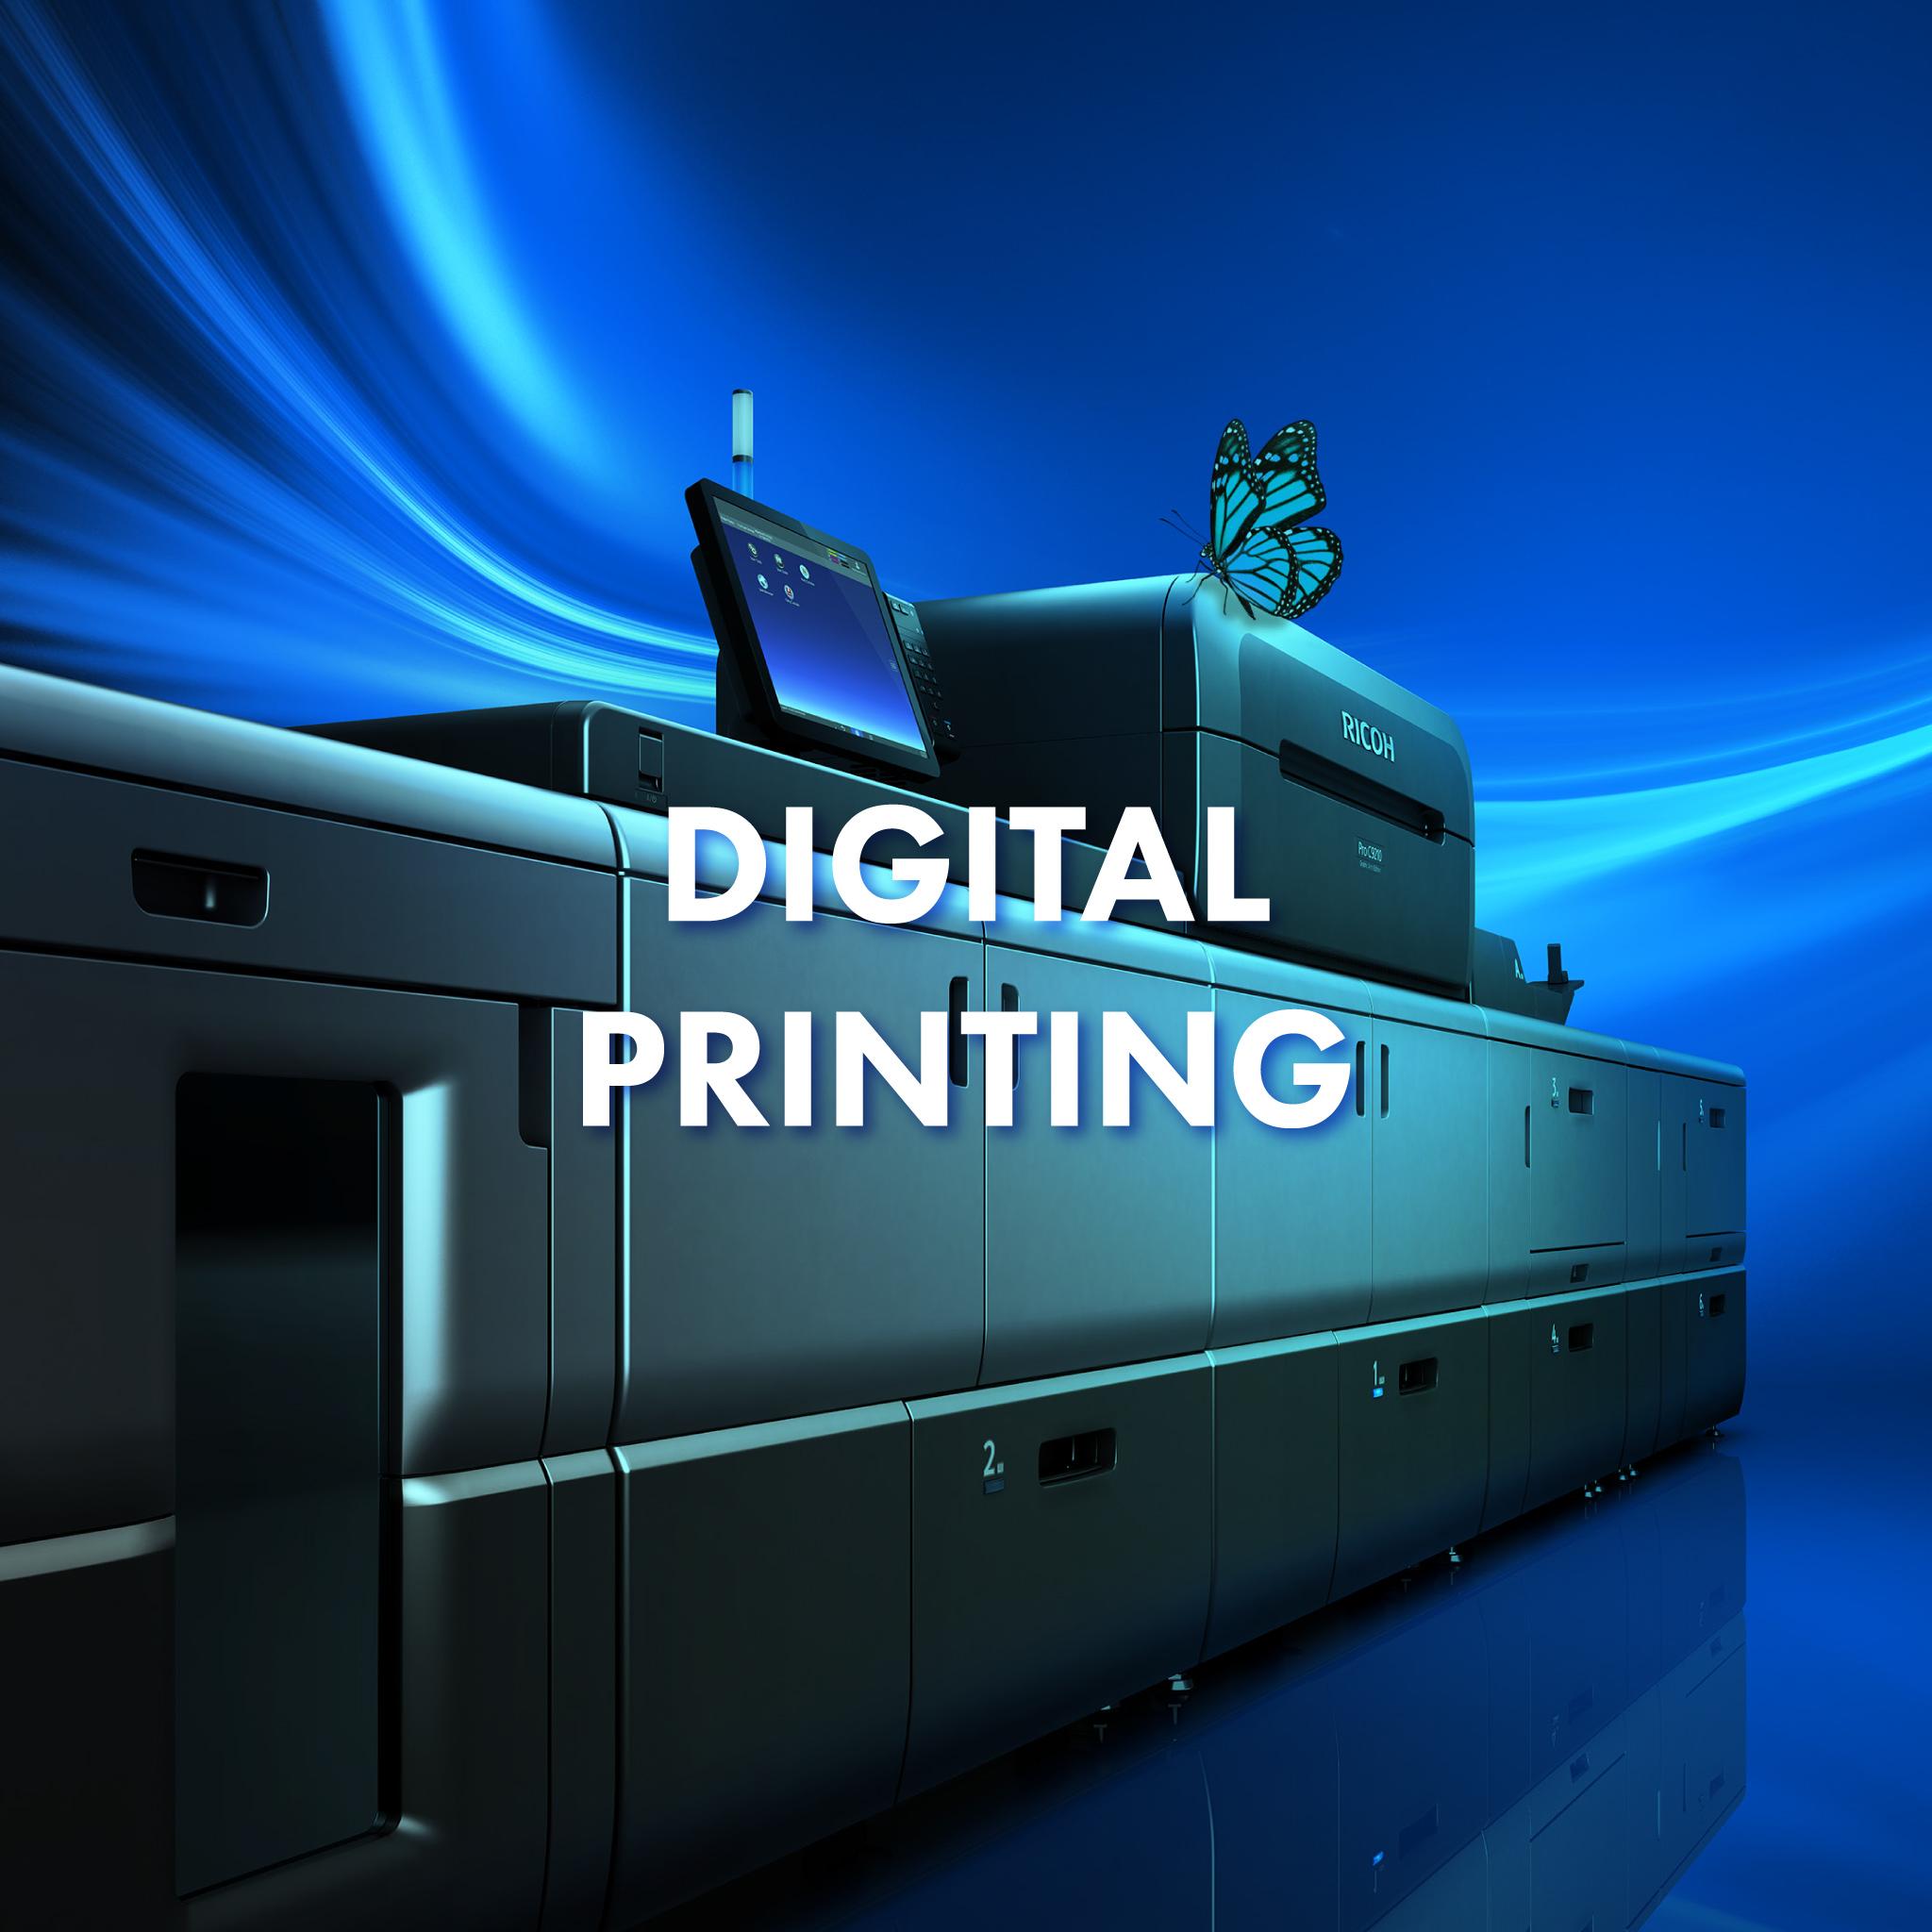 Digital-Press-Image.jpg